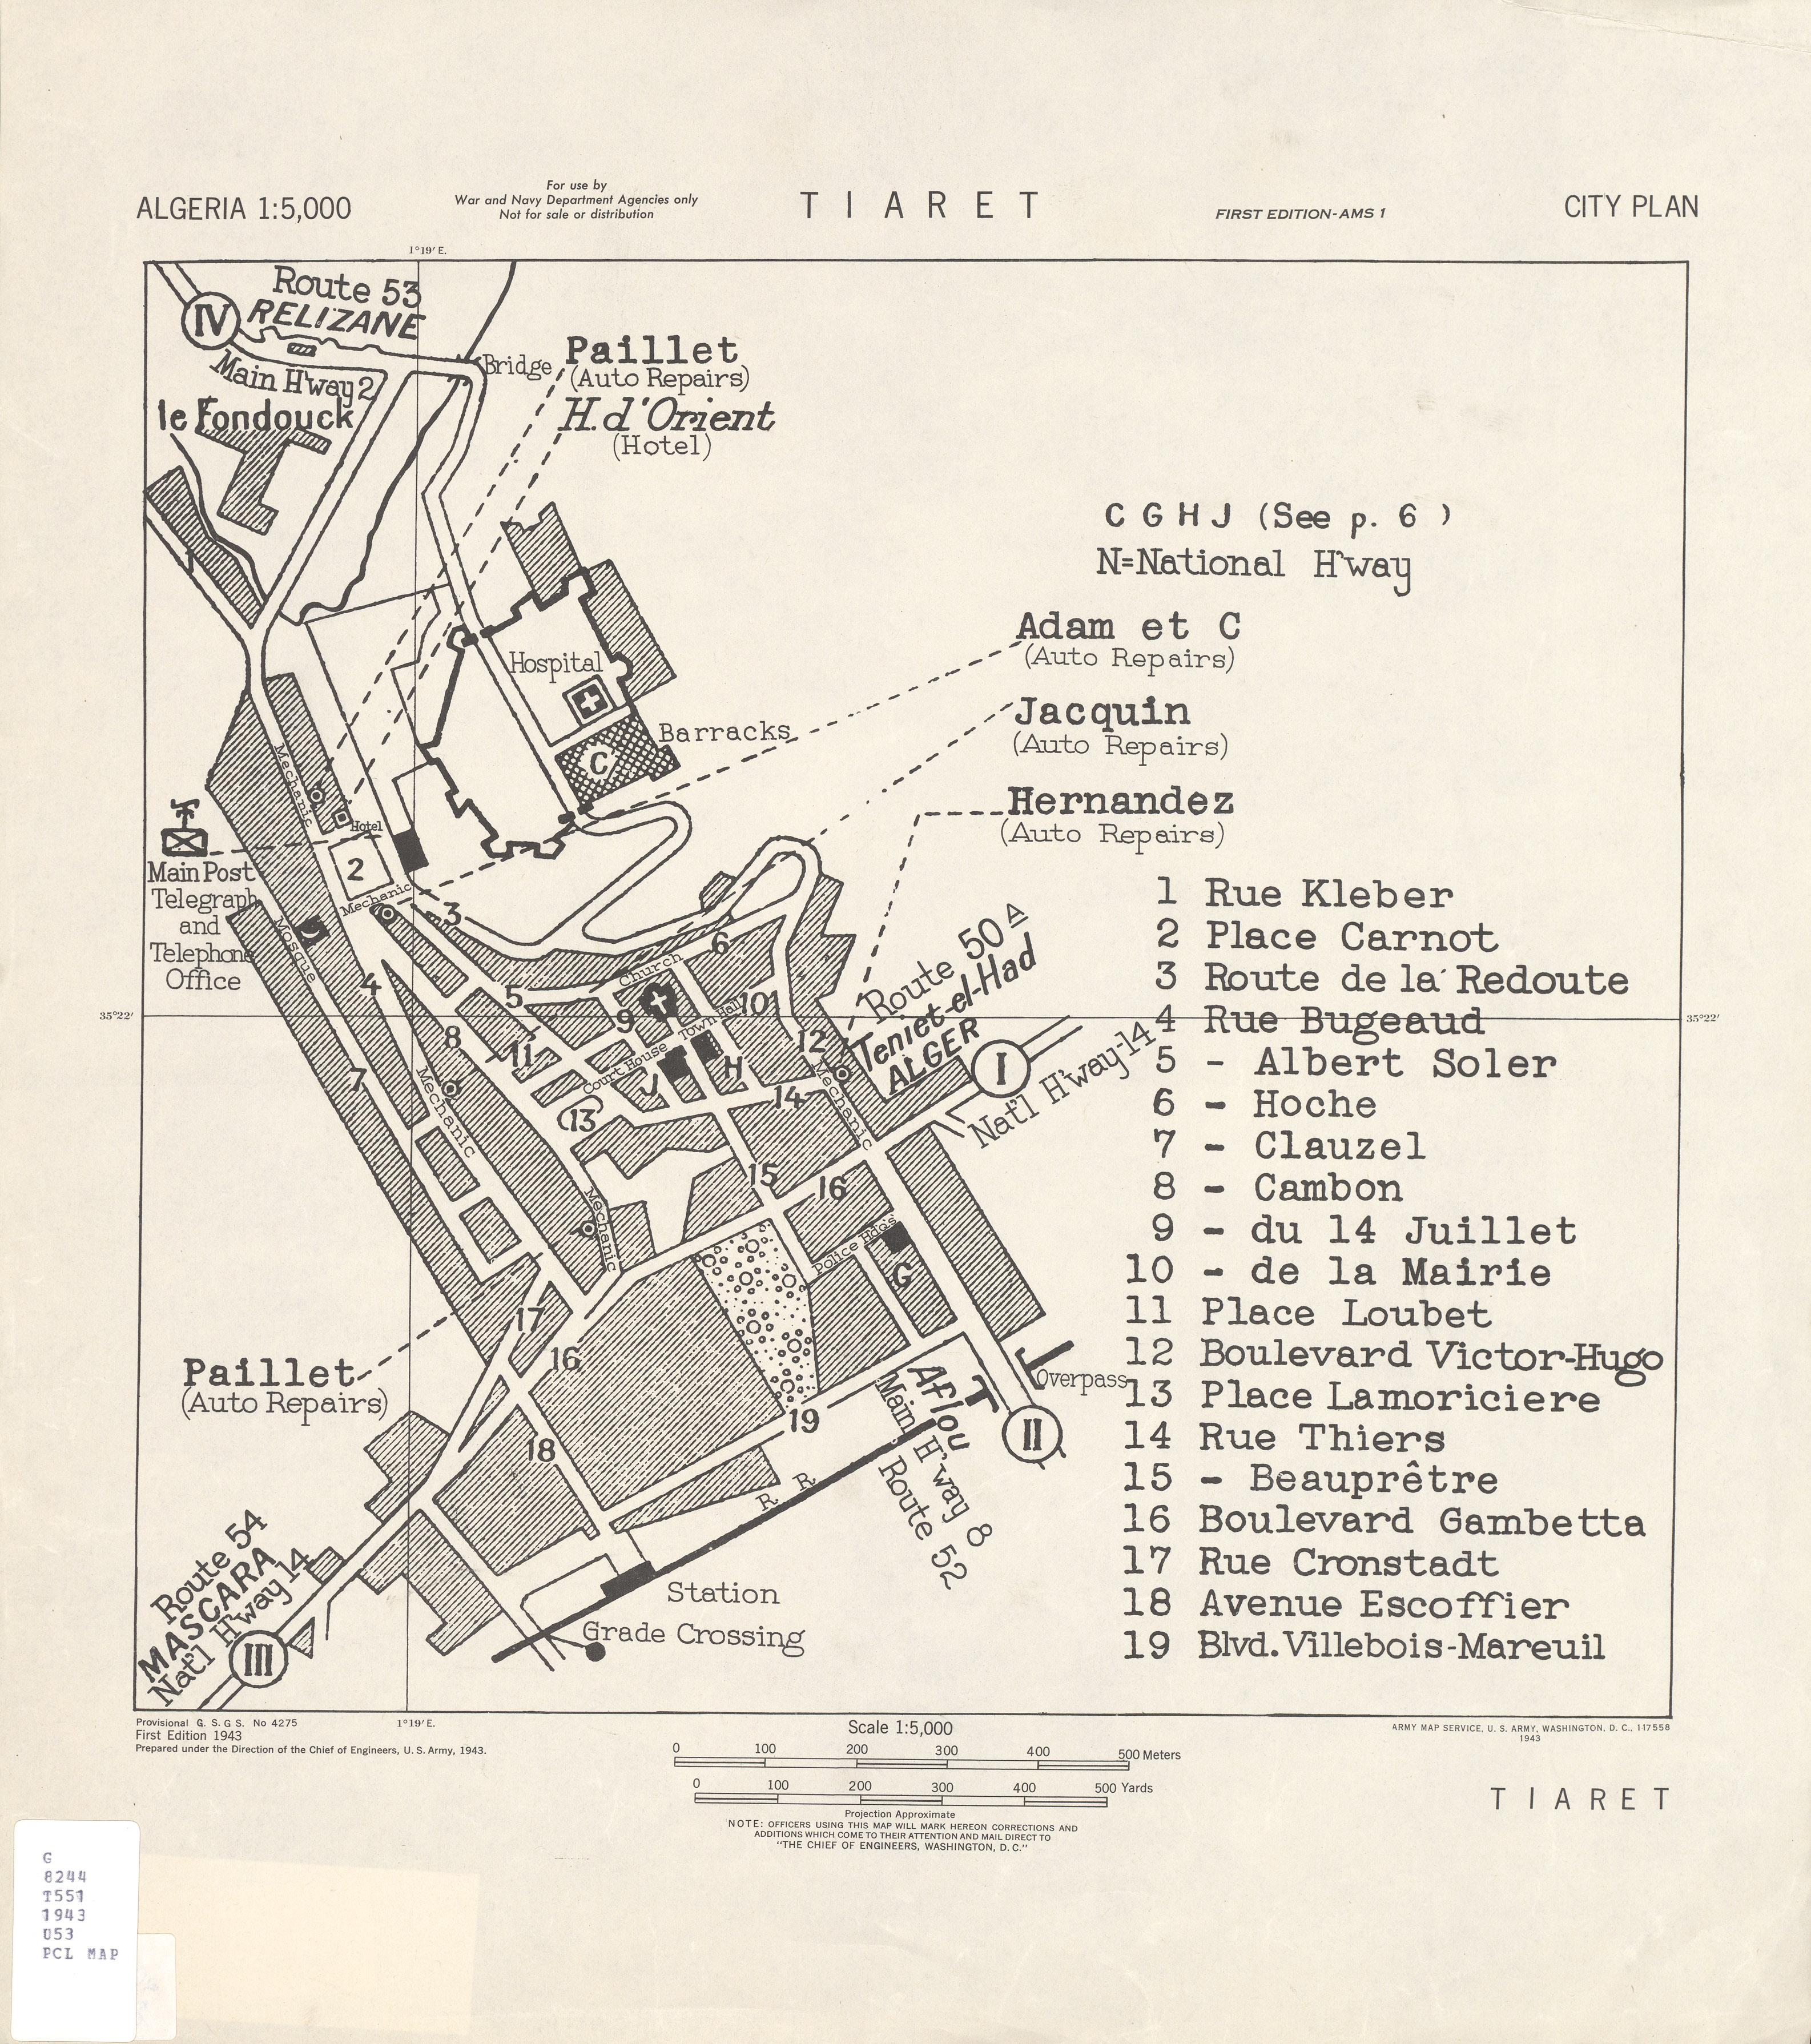 Mapa de la Ciudad de Tiaret, Argelia 1943